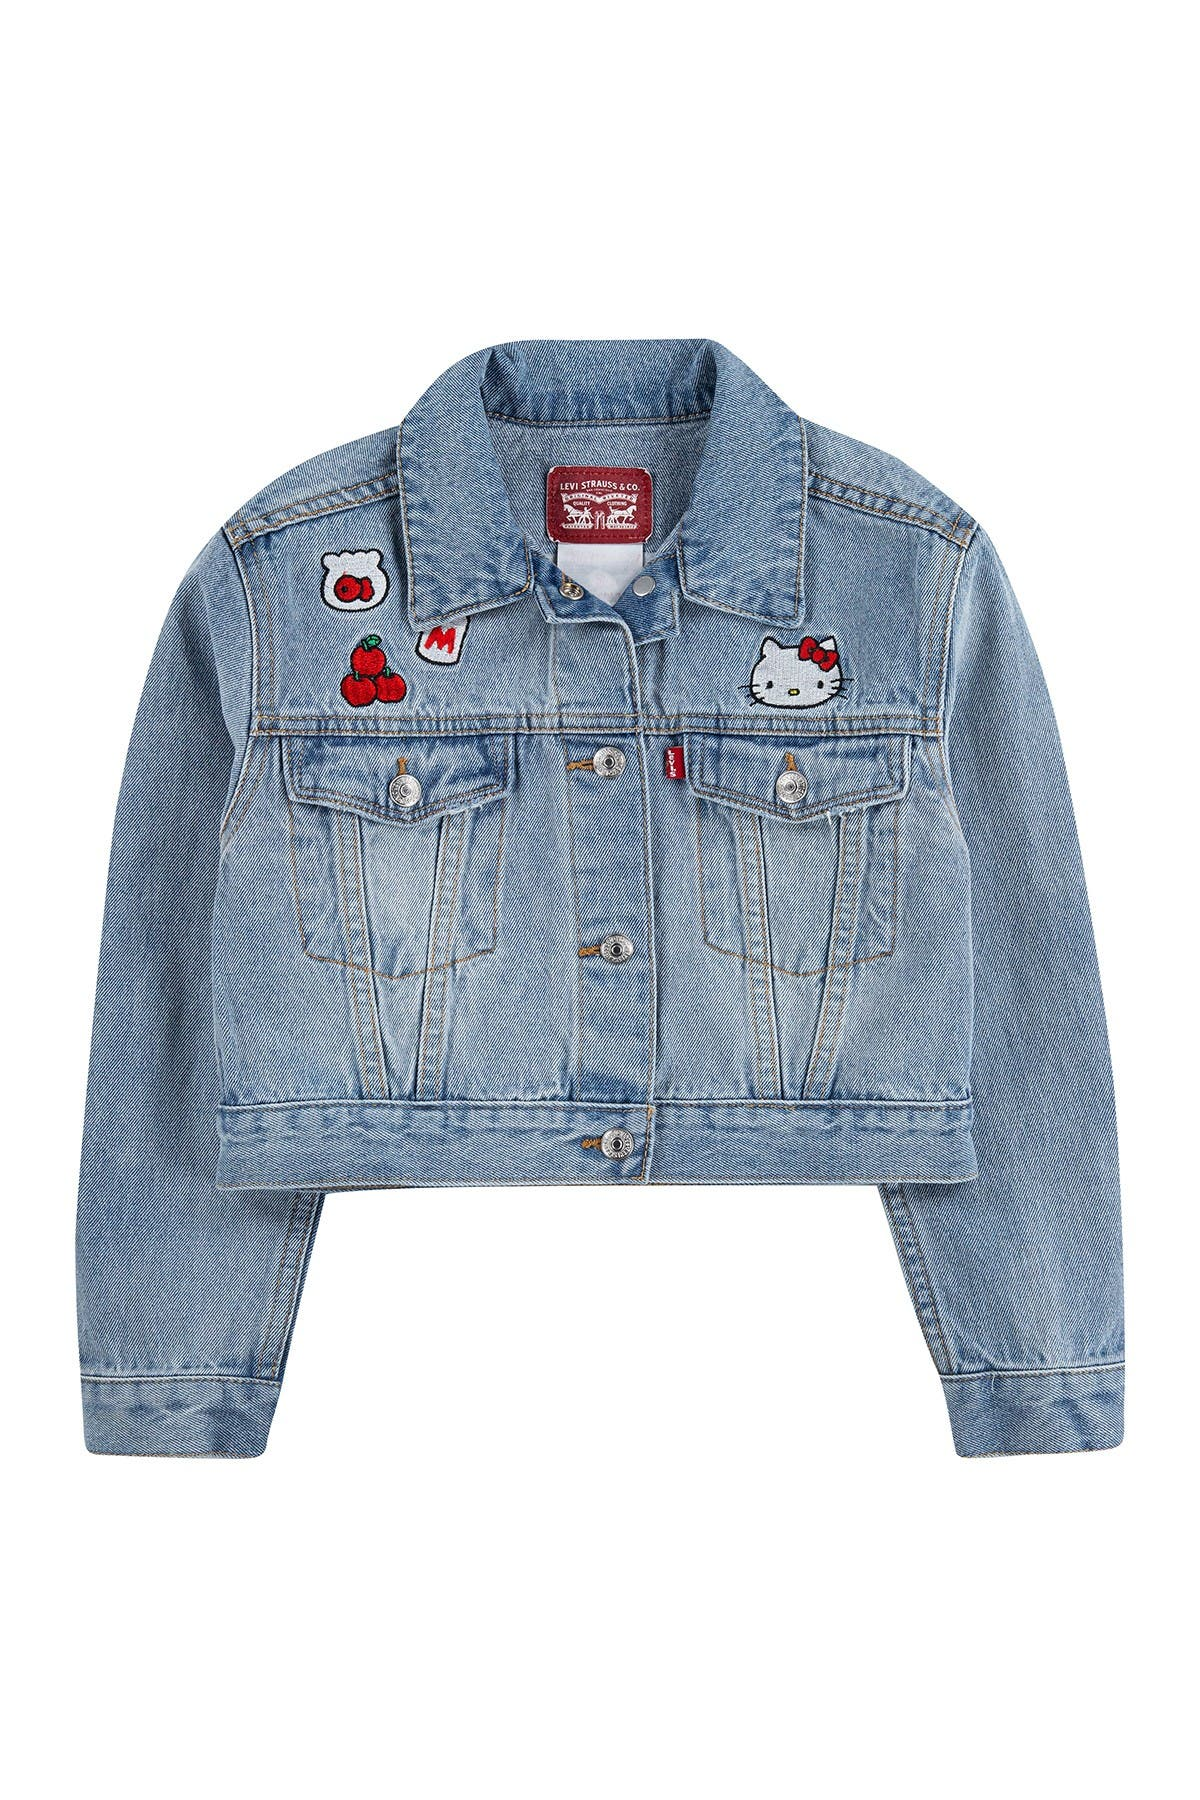 Image of Levi's Hello Kitty Denim Trucker Jacket